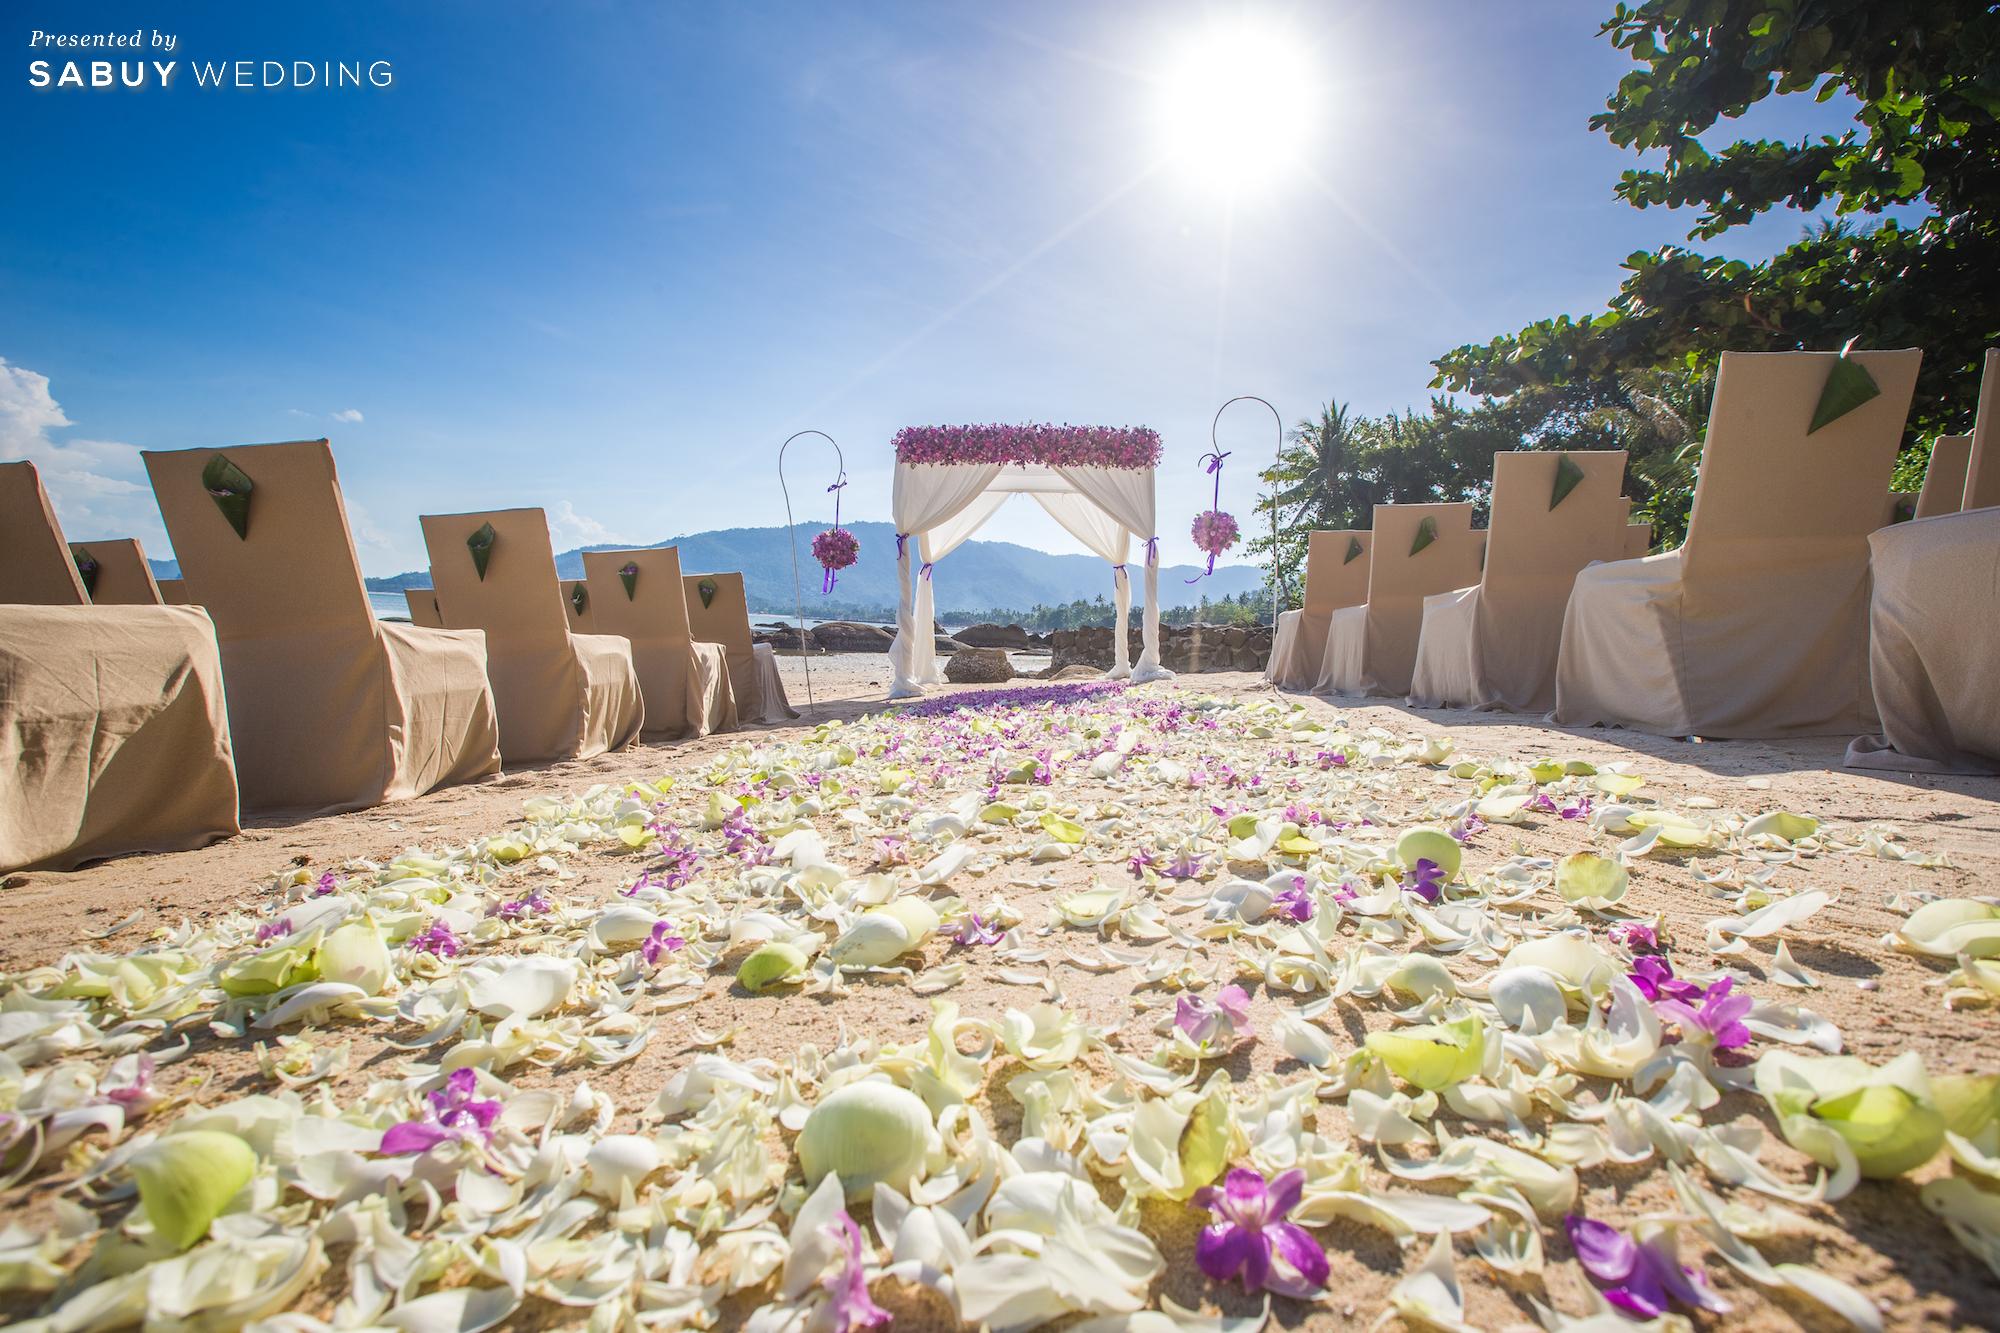 RENAISSANCE KOH SAMUI RESORT & SPA,Marriott Wedding Thailand,แมริออท ประเทศไทย,สถานที่แต่งงาน,สถานที่จัดงานแต่งงาน,โรงแรม,งานแต่งงาน,งานแต่ง outdoor,งานแต่งริมทะเล,งานแต่งชายทะเล ครบทุกความต้องการของบ่าวสาว กับ 40 สถานที่แต่งงานในเครือ Marriott